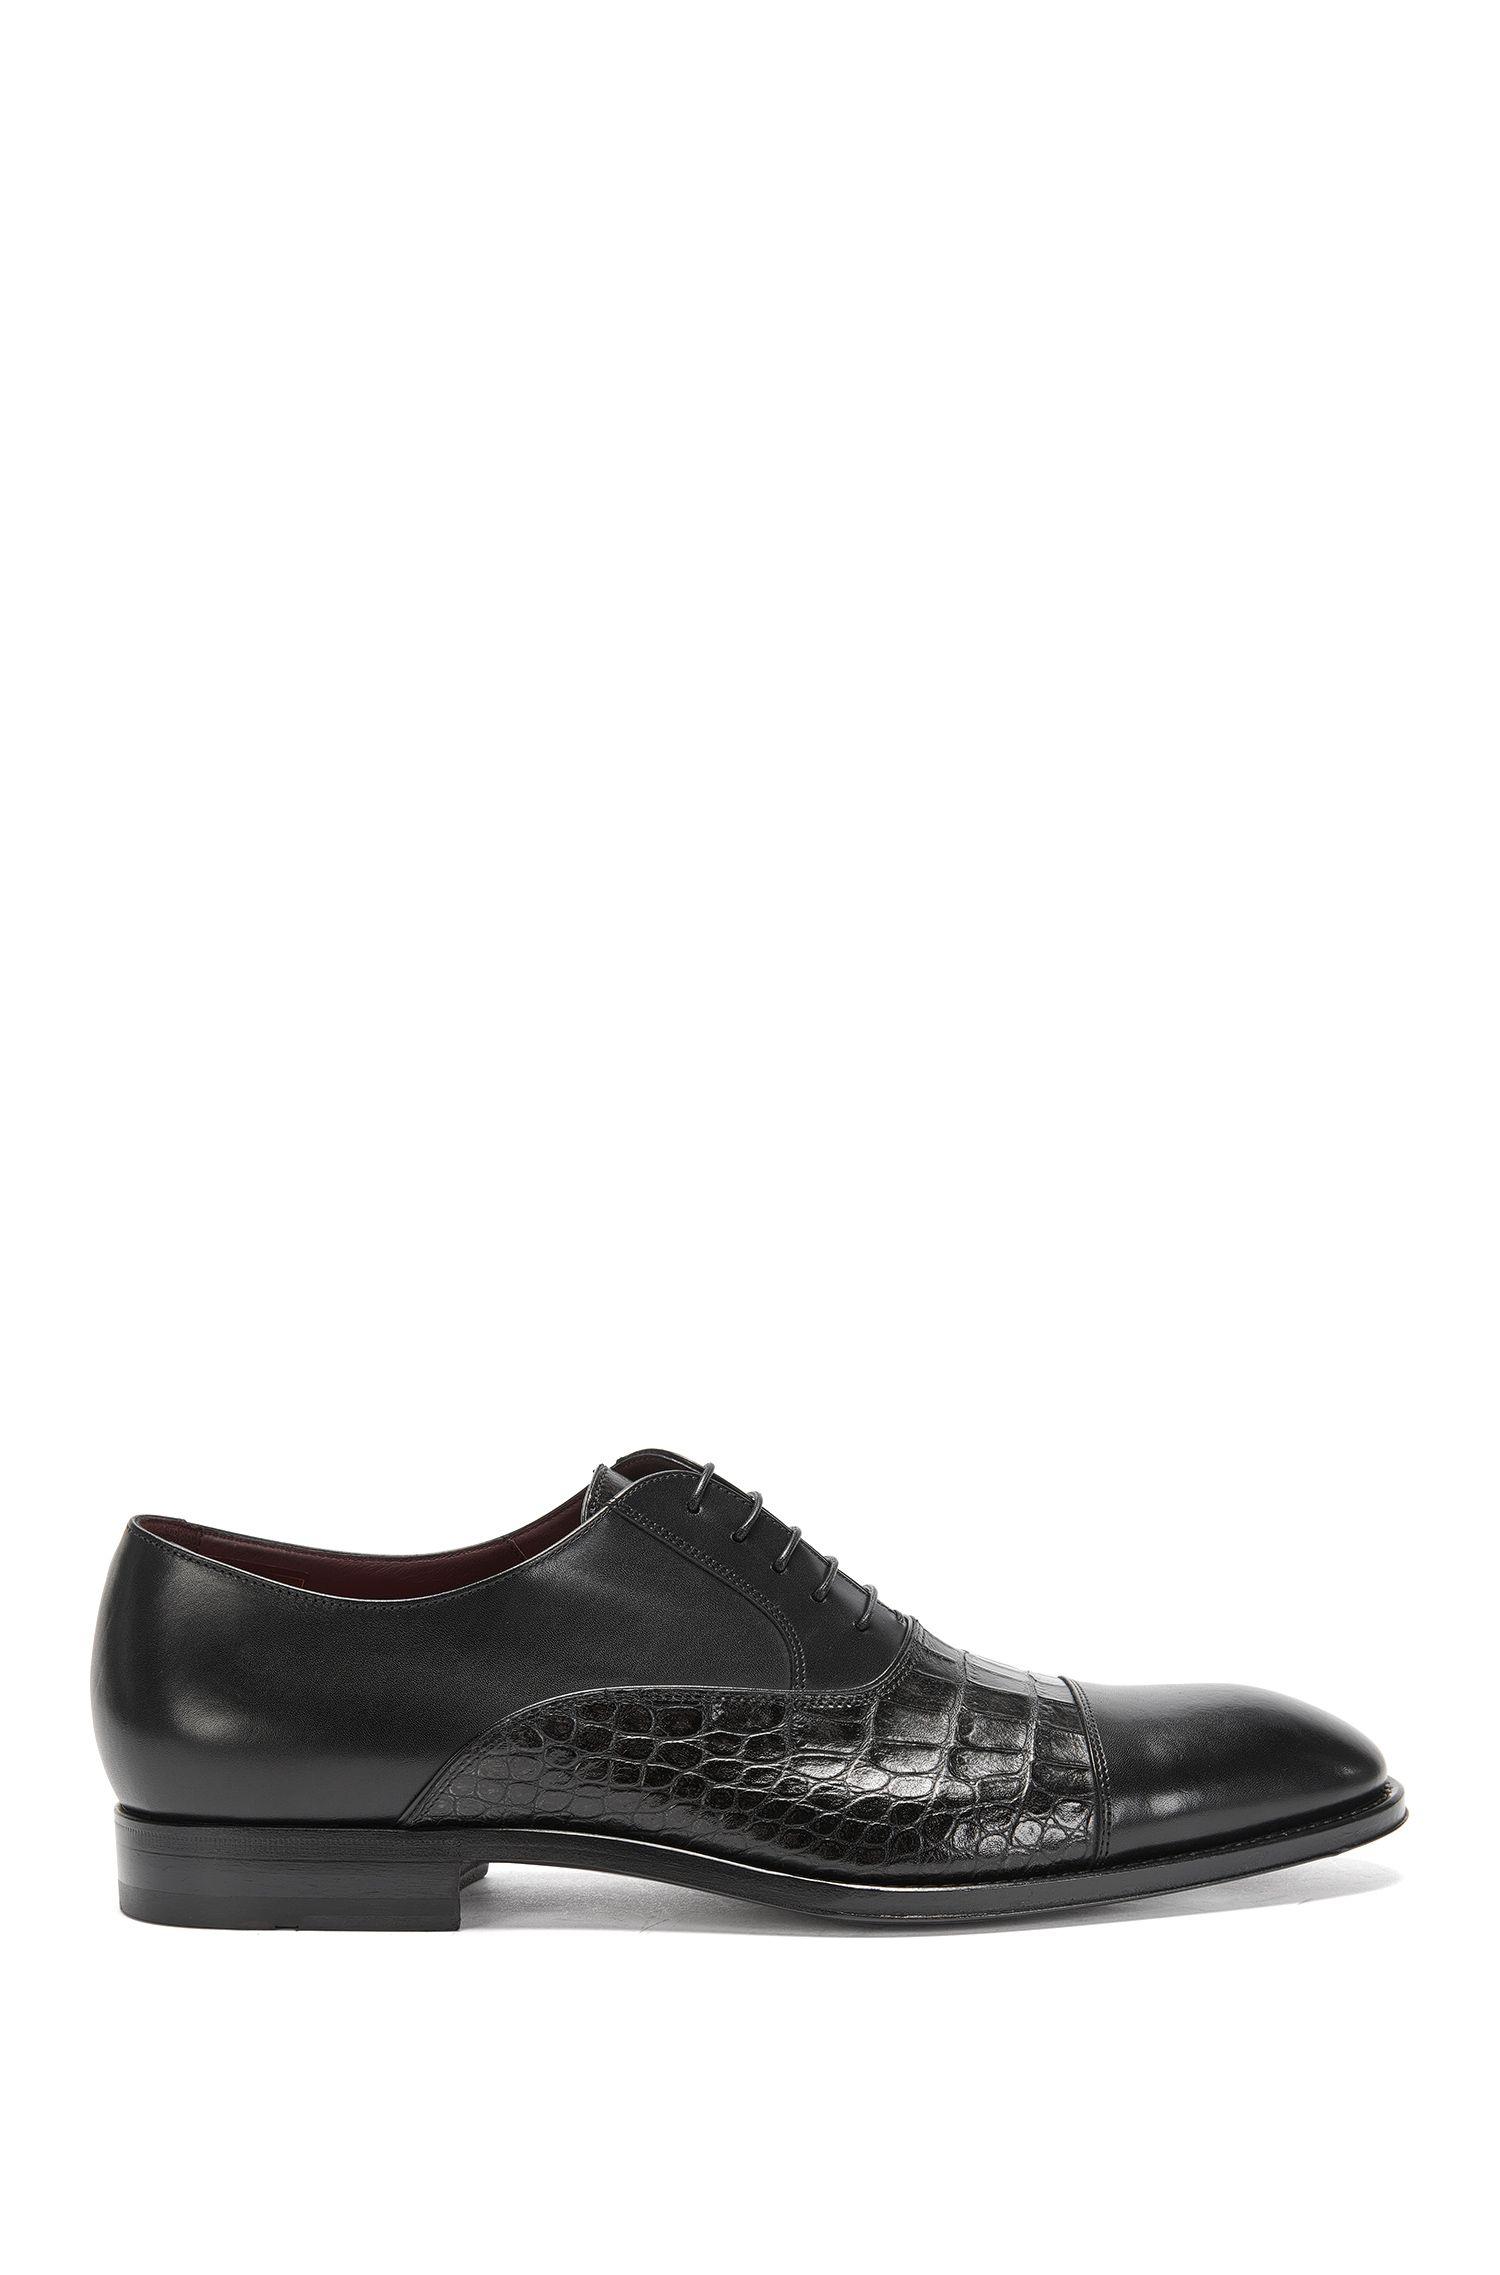 Zapatos con cordones Tailored en piel: 'T-Legend_Oxfr_exct'